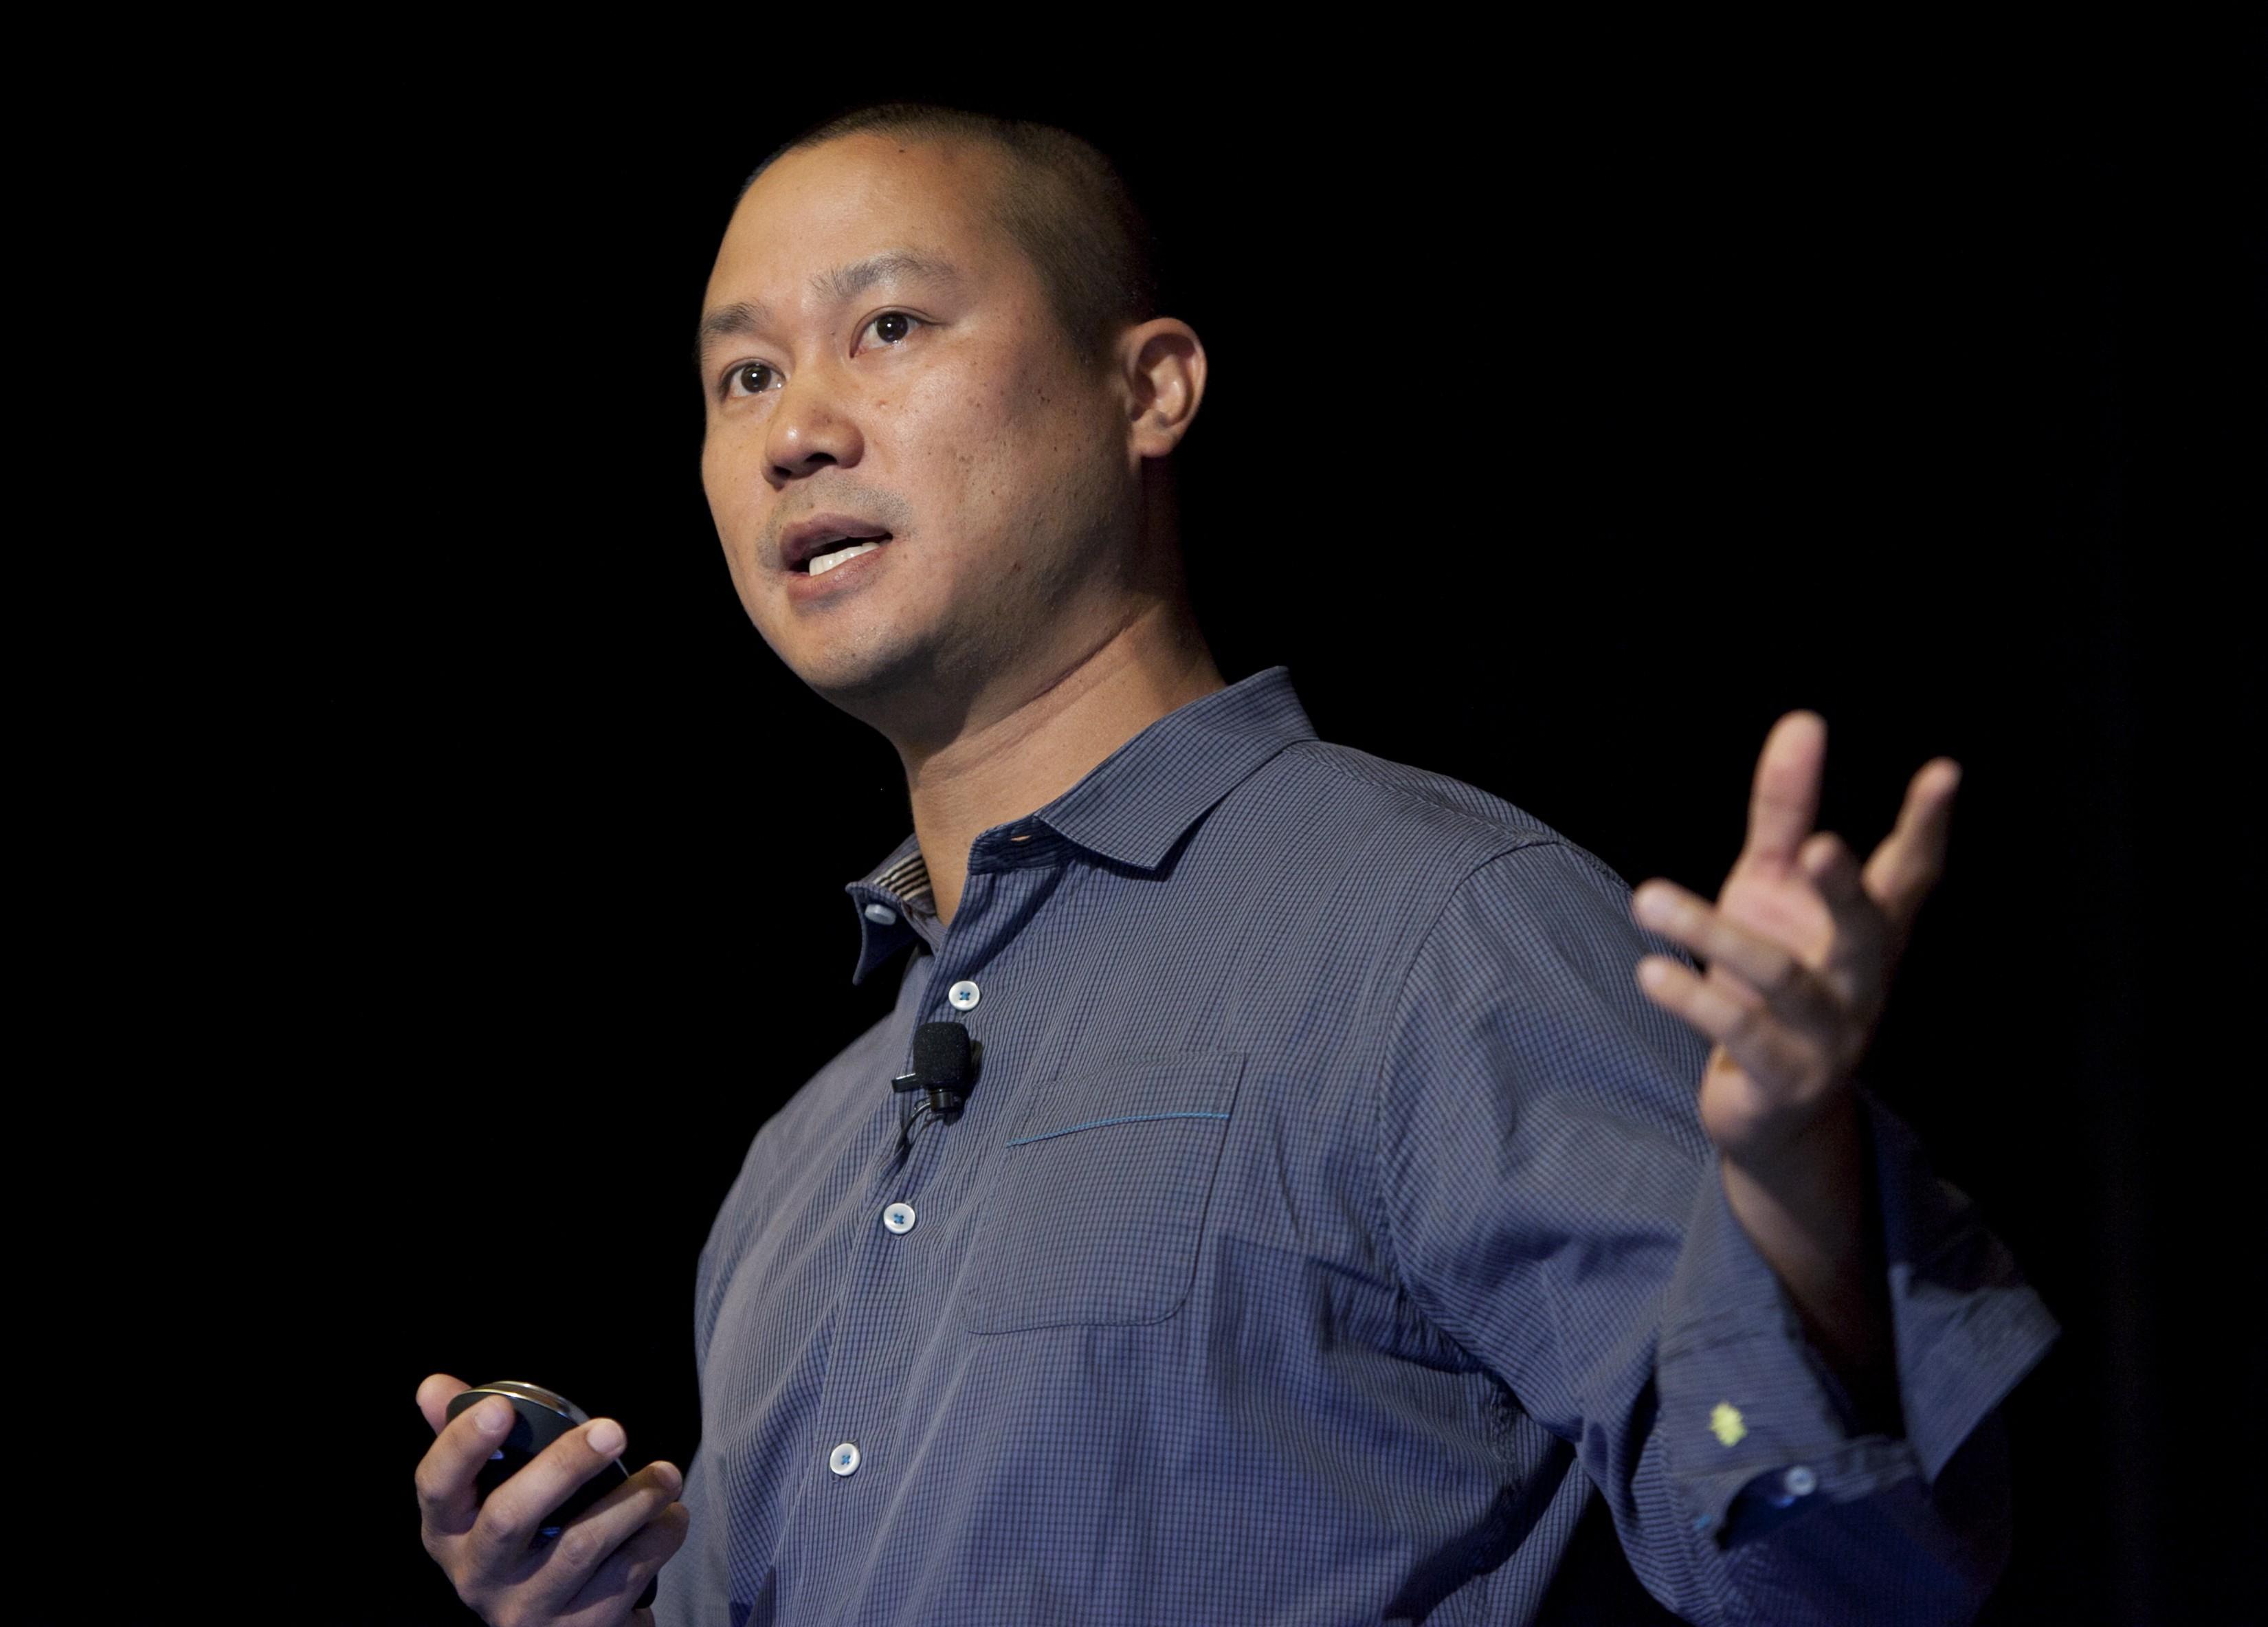 Tony Hsieh, criador e ex-CEO da Zappos, morre aos 46 anos